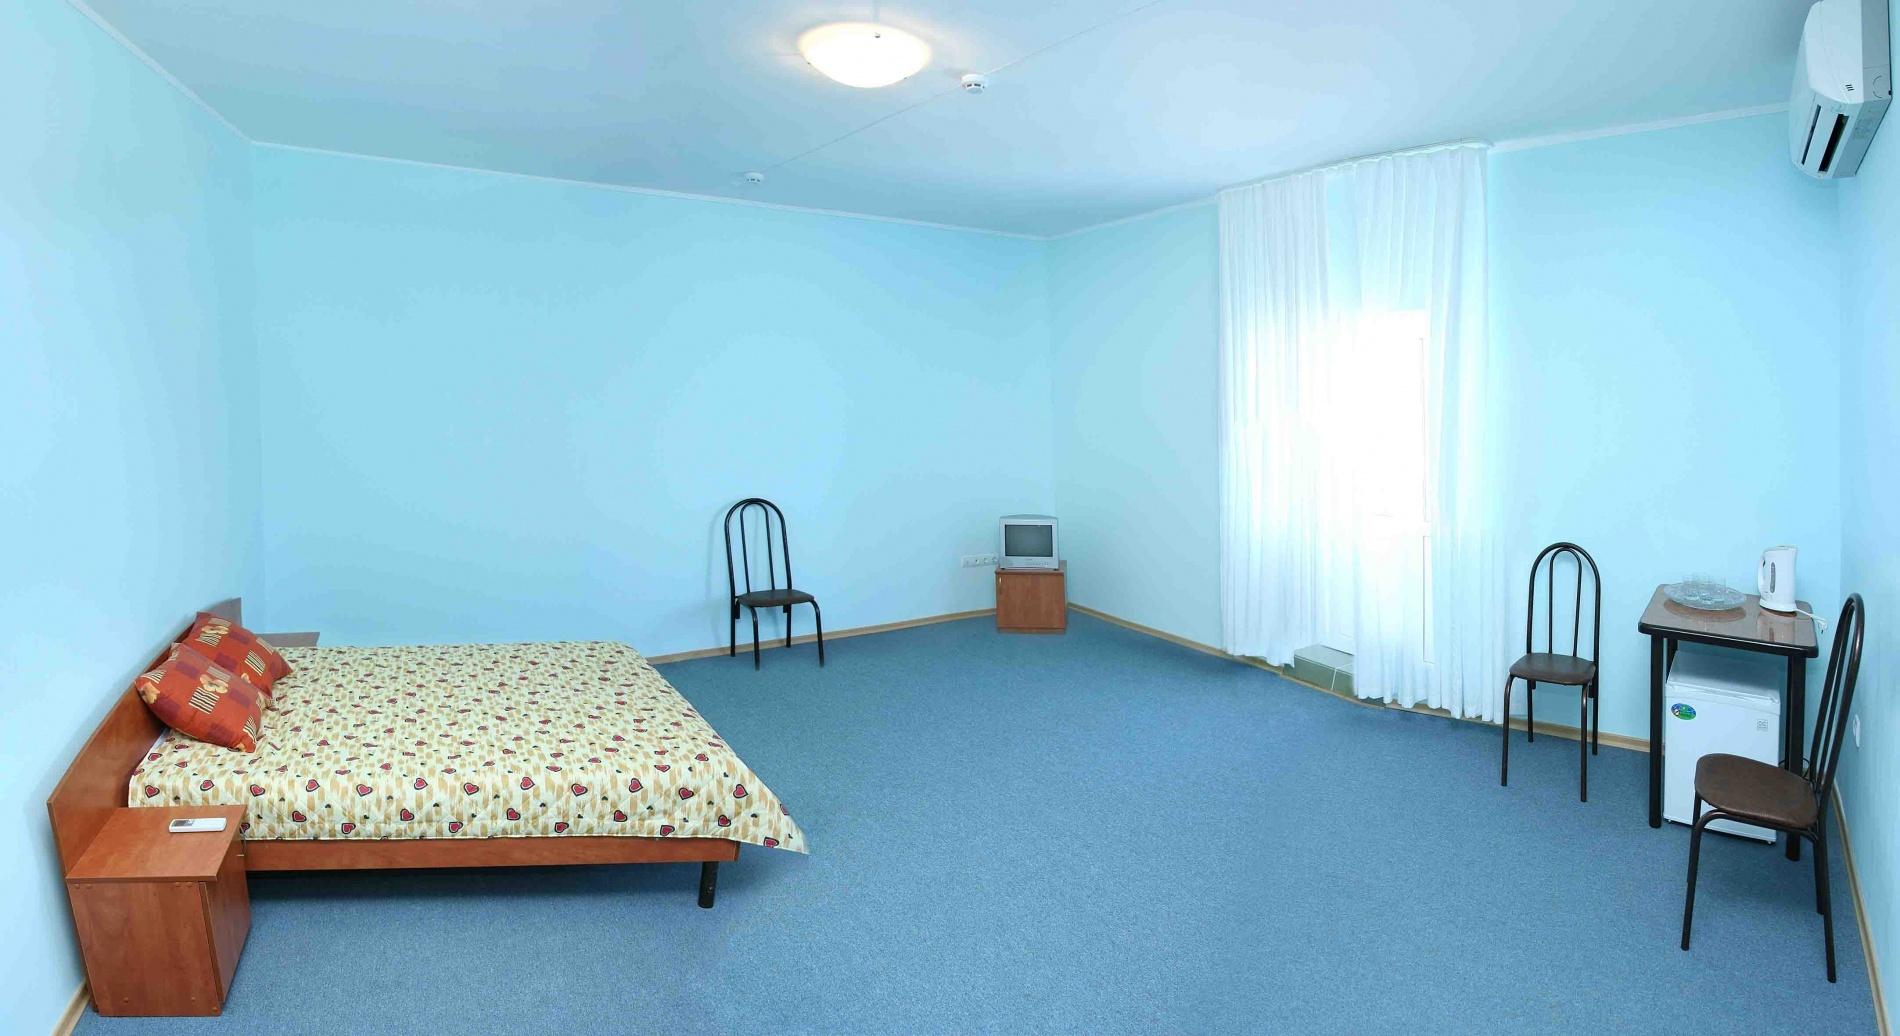 "База отдыха ""Казачий берег"" Краснодарский край 4-х местный 2-х комнатный номер, фото 1"